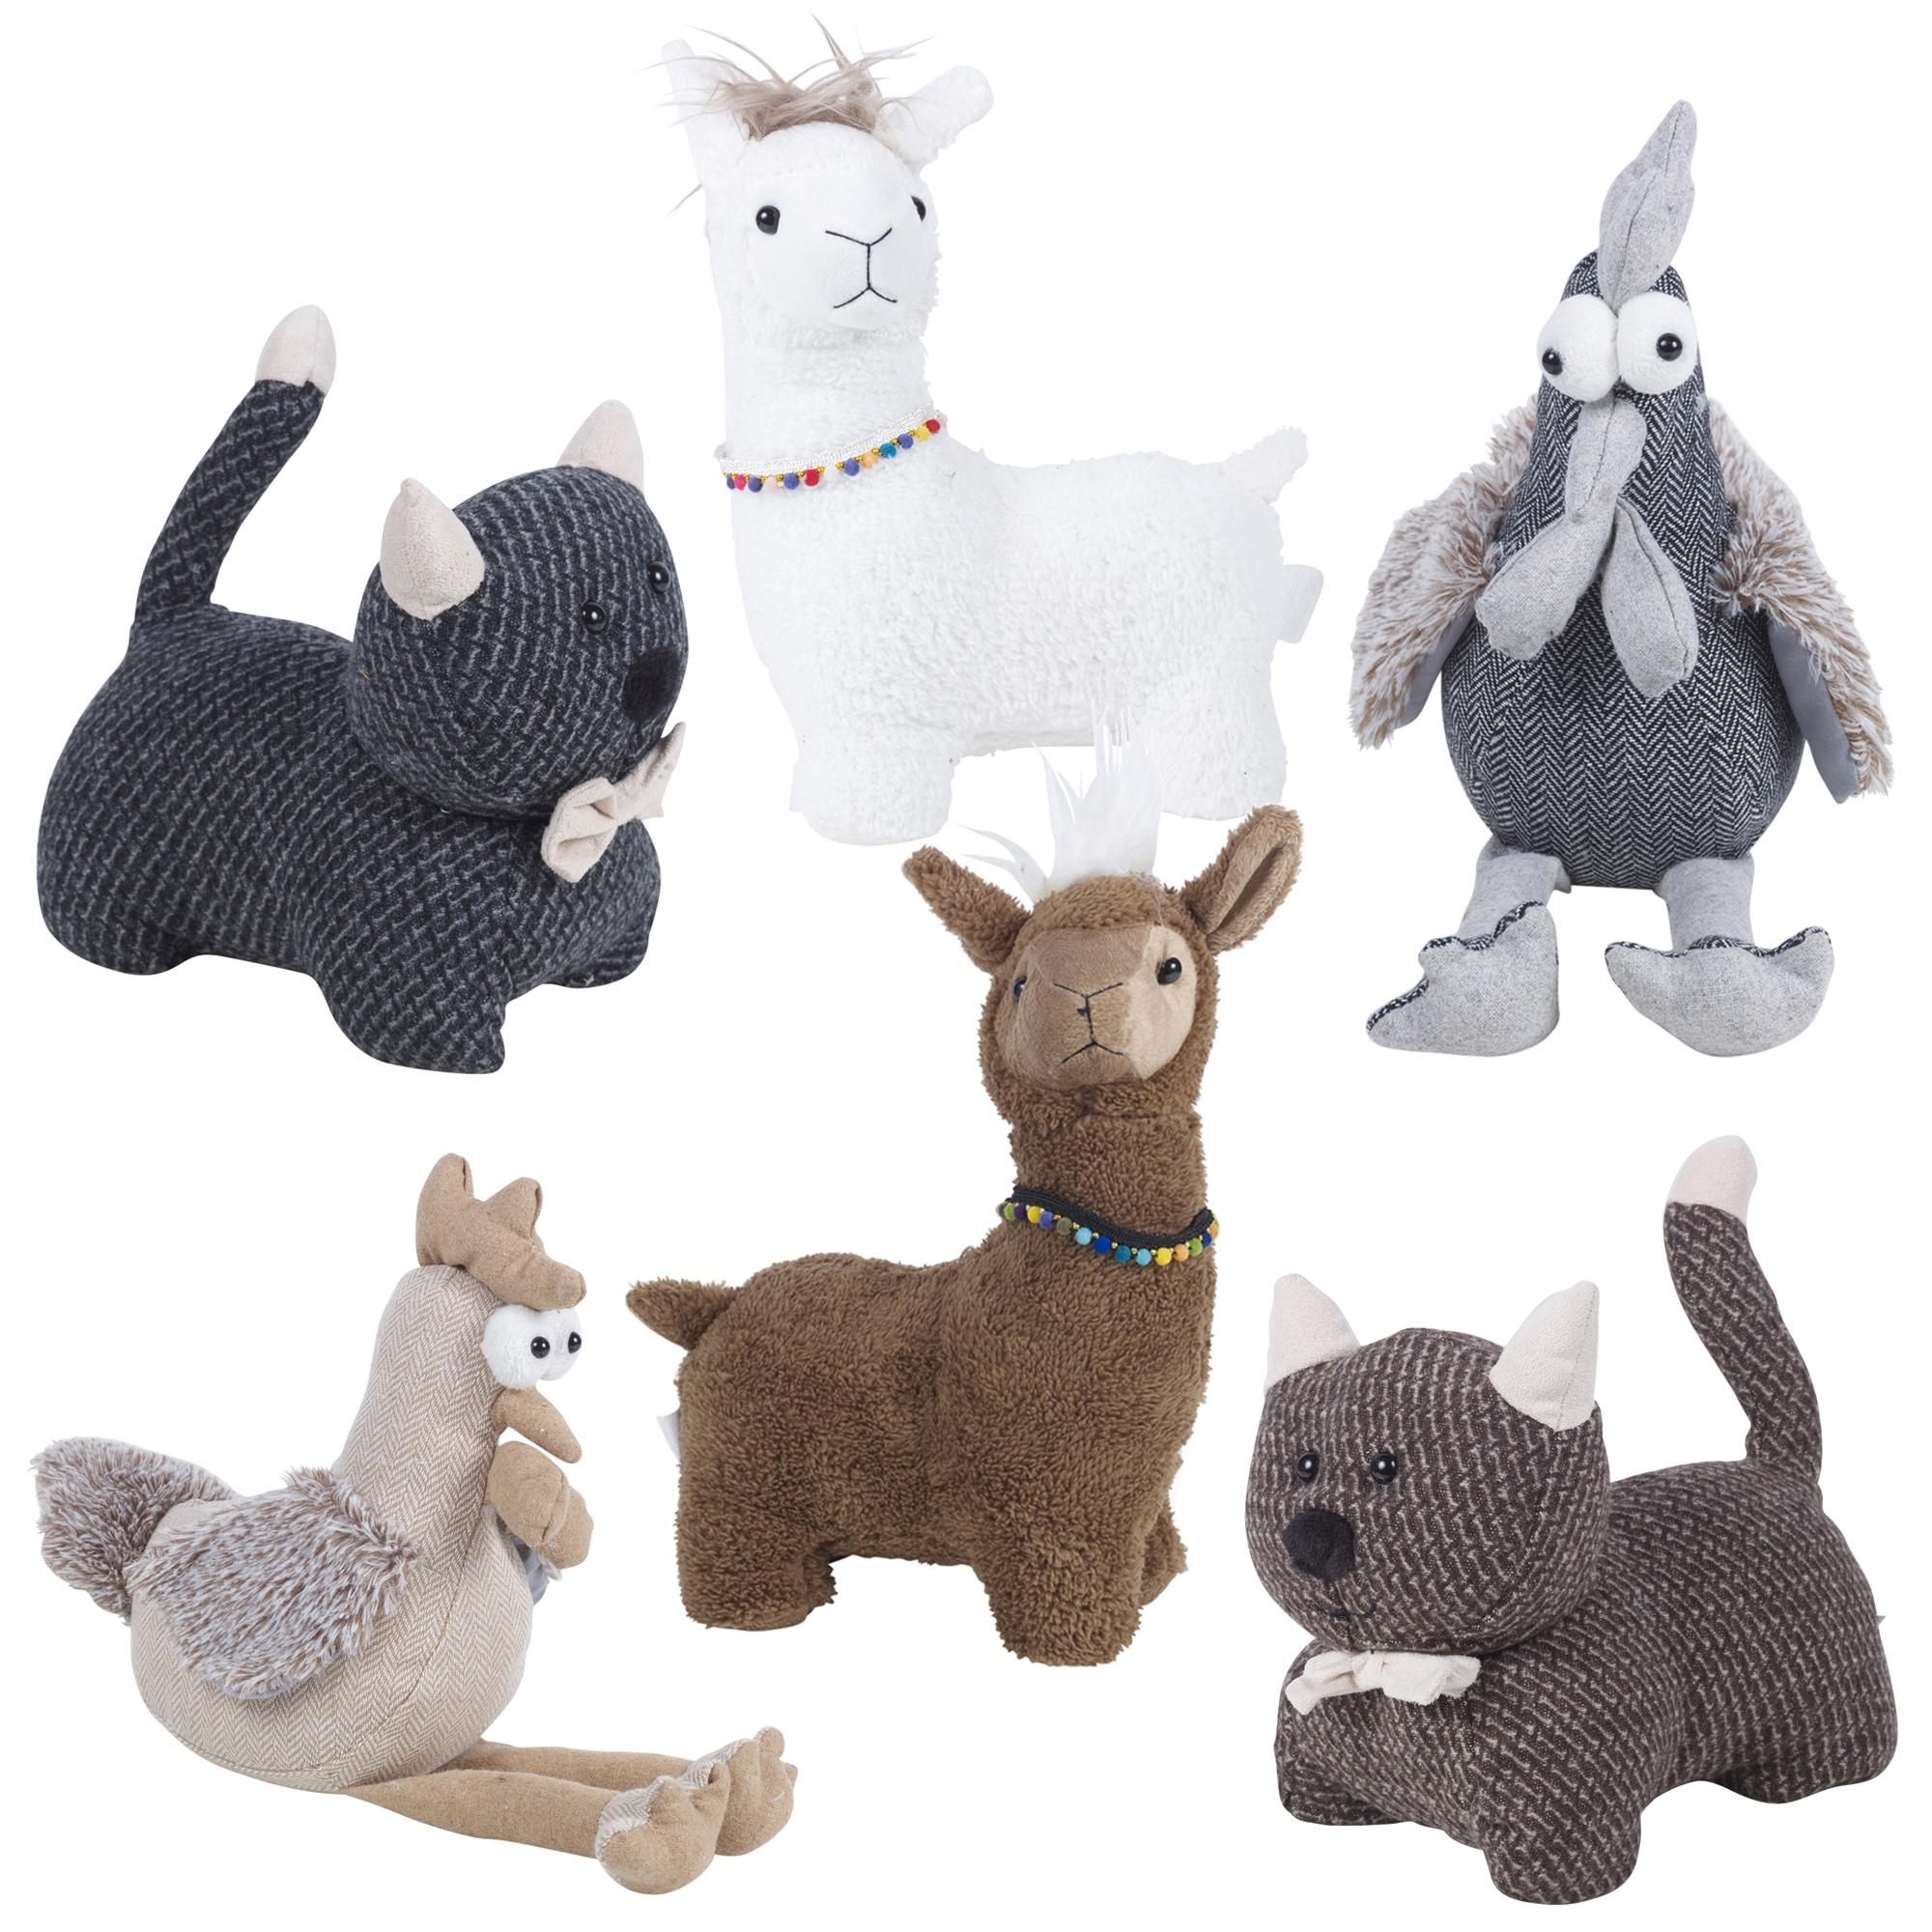 Novelty Fabric Animal Pet Door Stop Stopper Wedge Filled Heavy Trendy Stylish Ebay